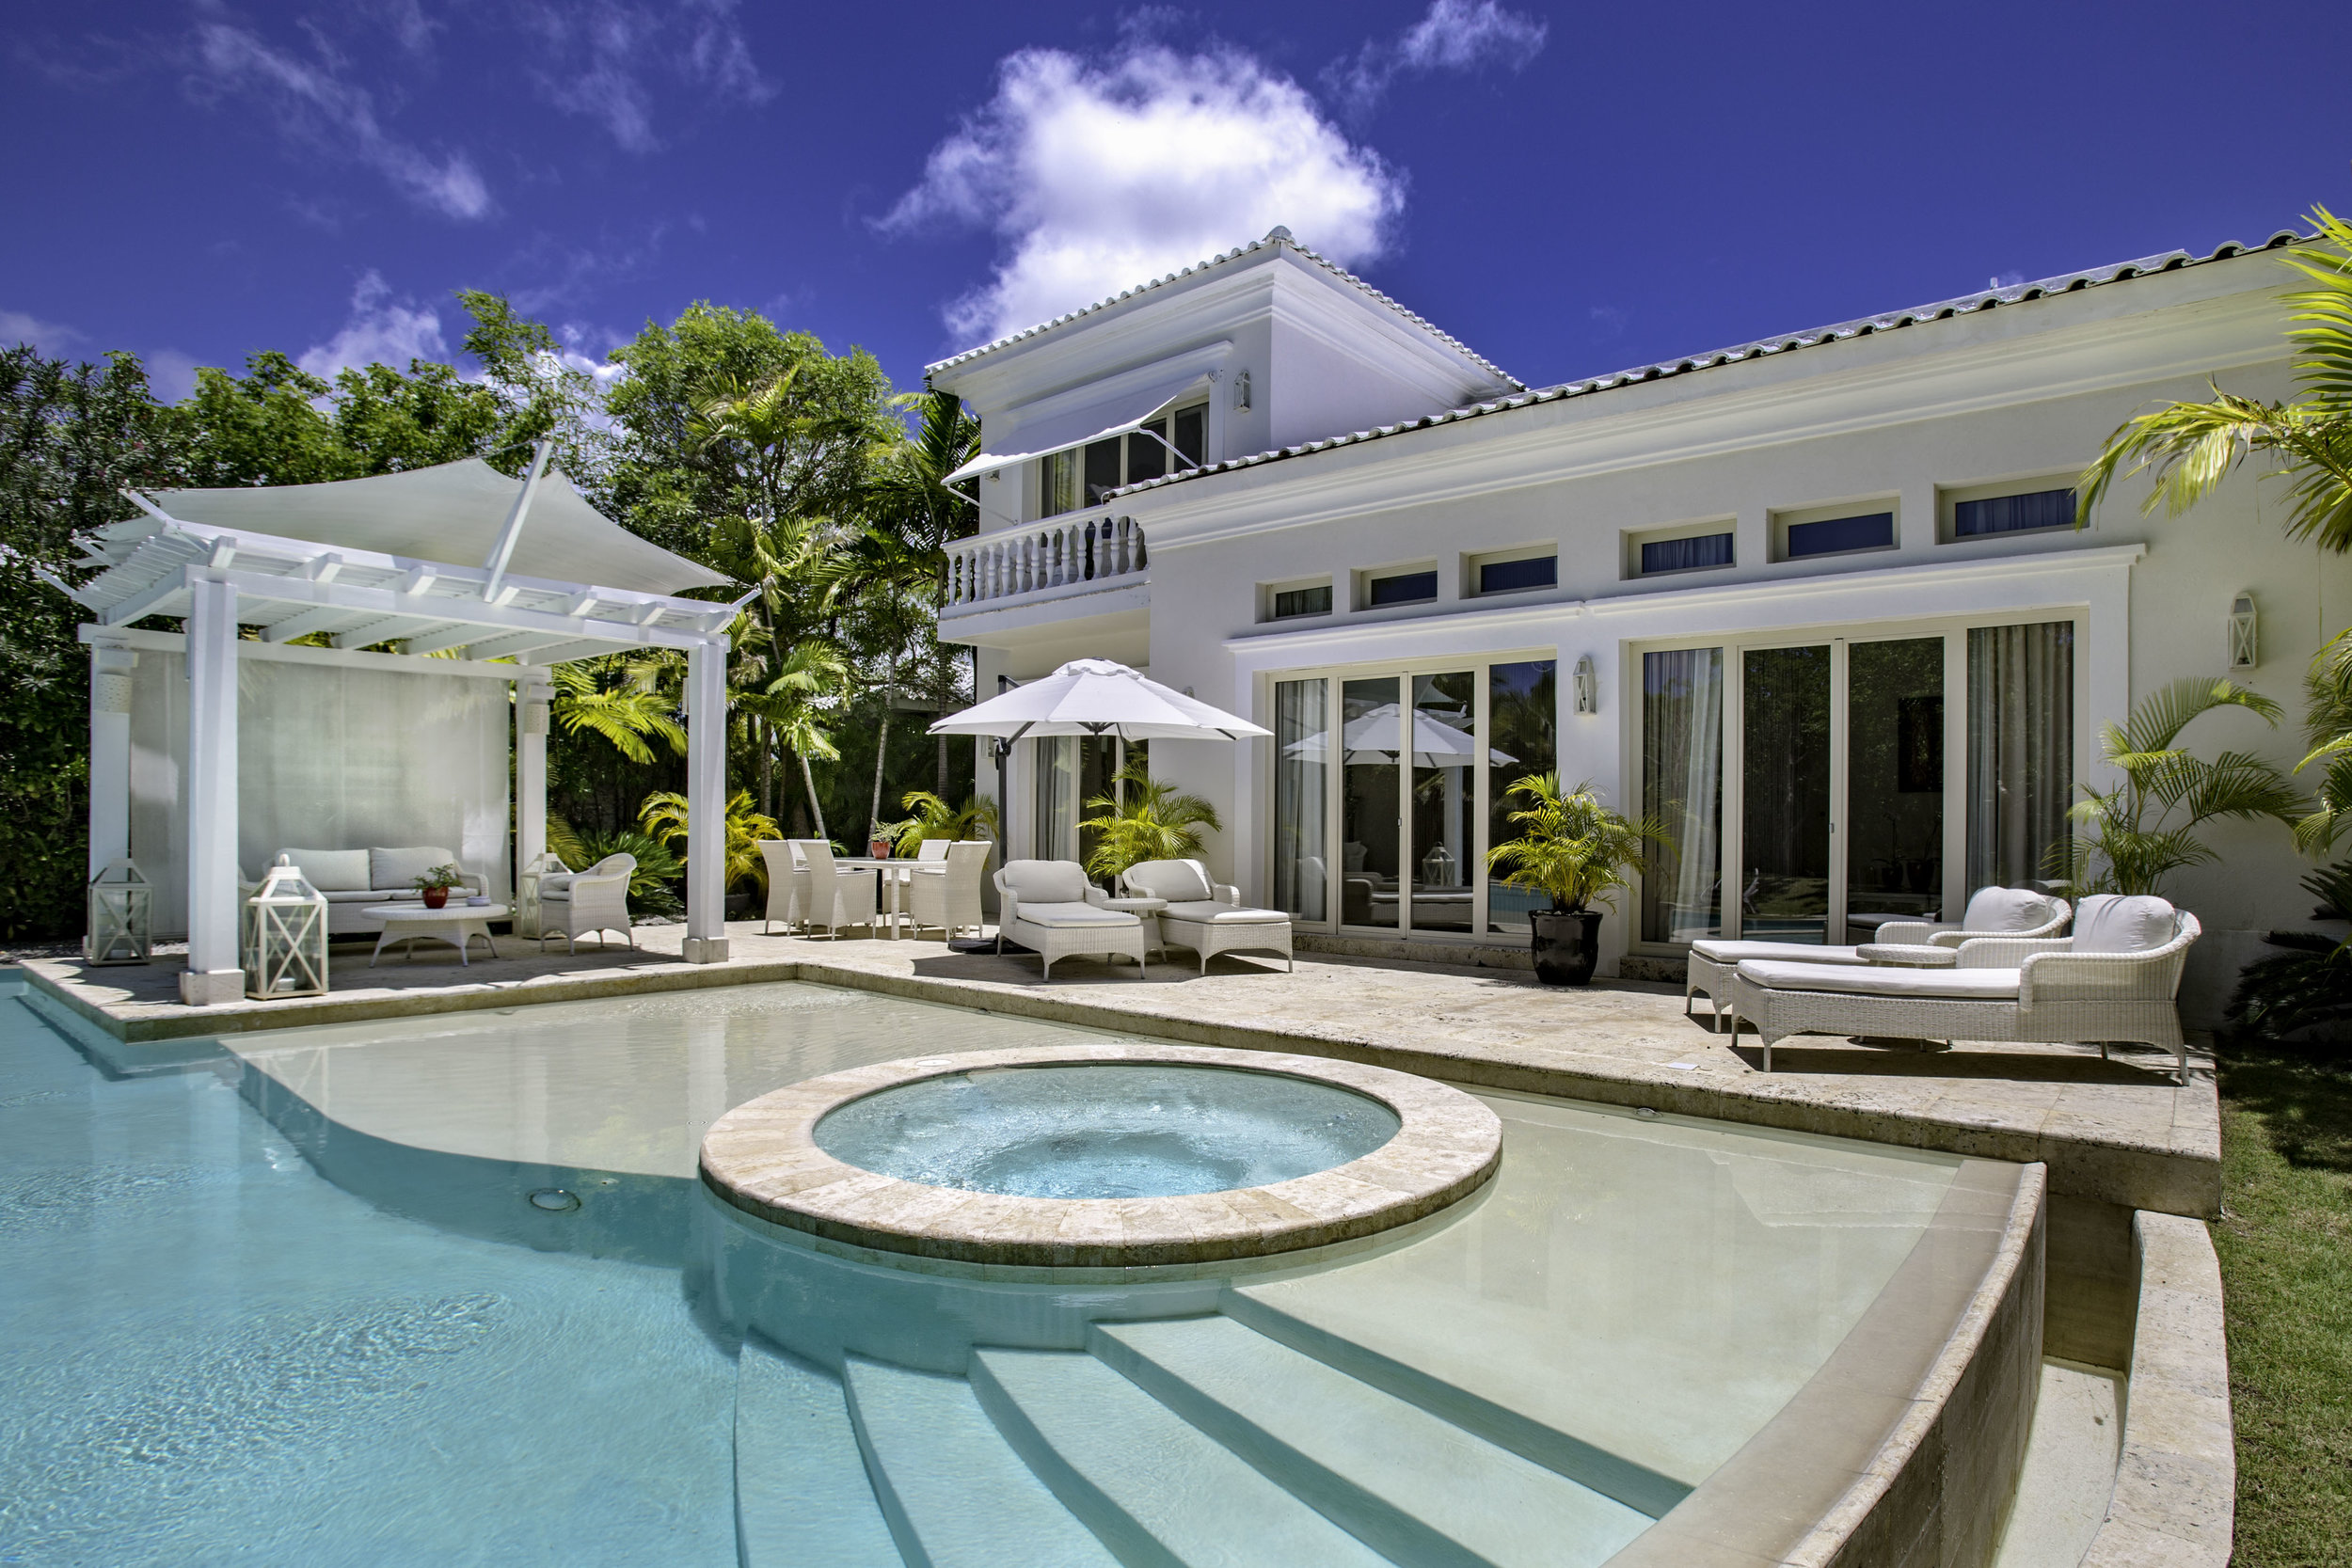 Three Bedroom Royale Villa_Swimming Pool_0635.jpg